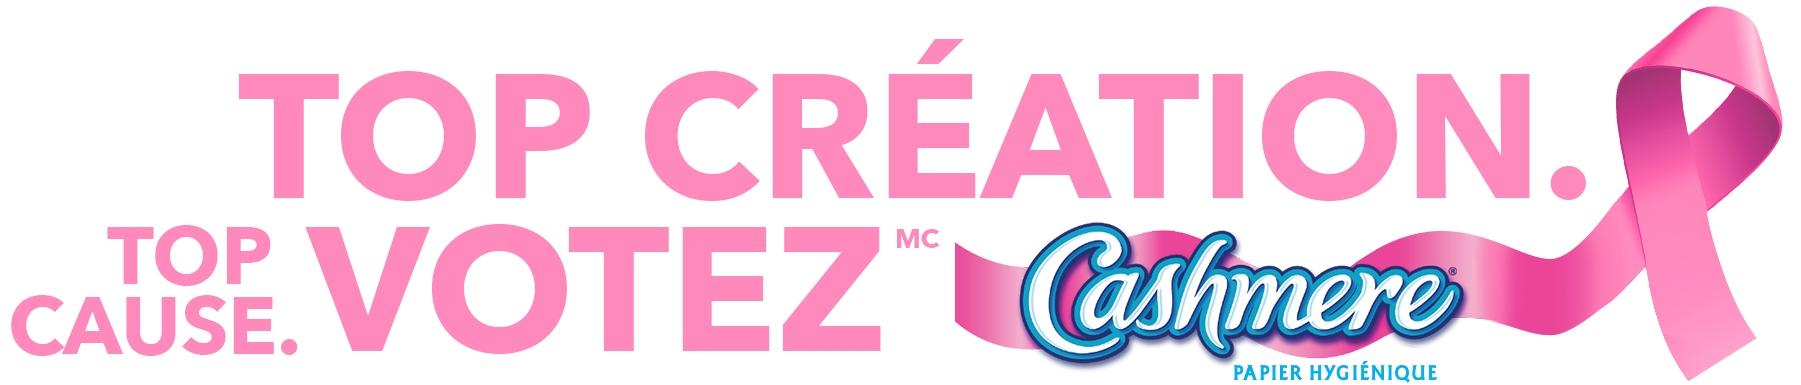 VCC logo 2016 horizontal FR on white.jpg